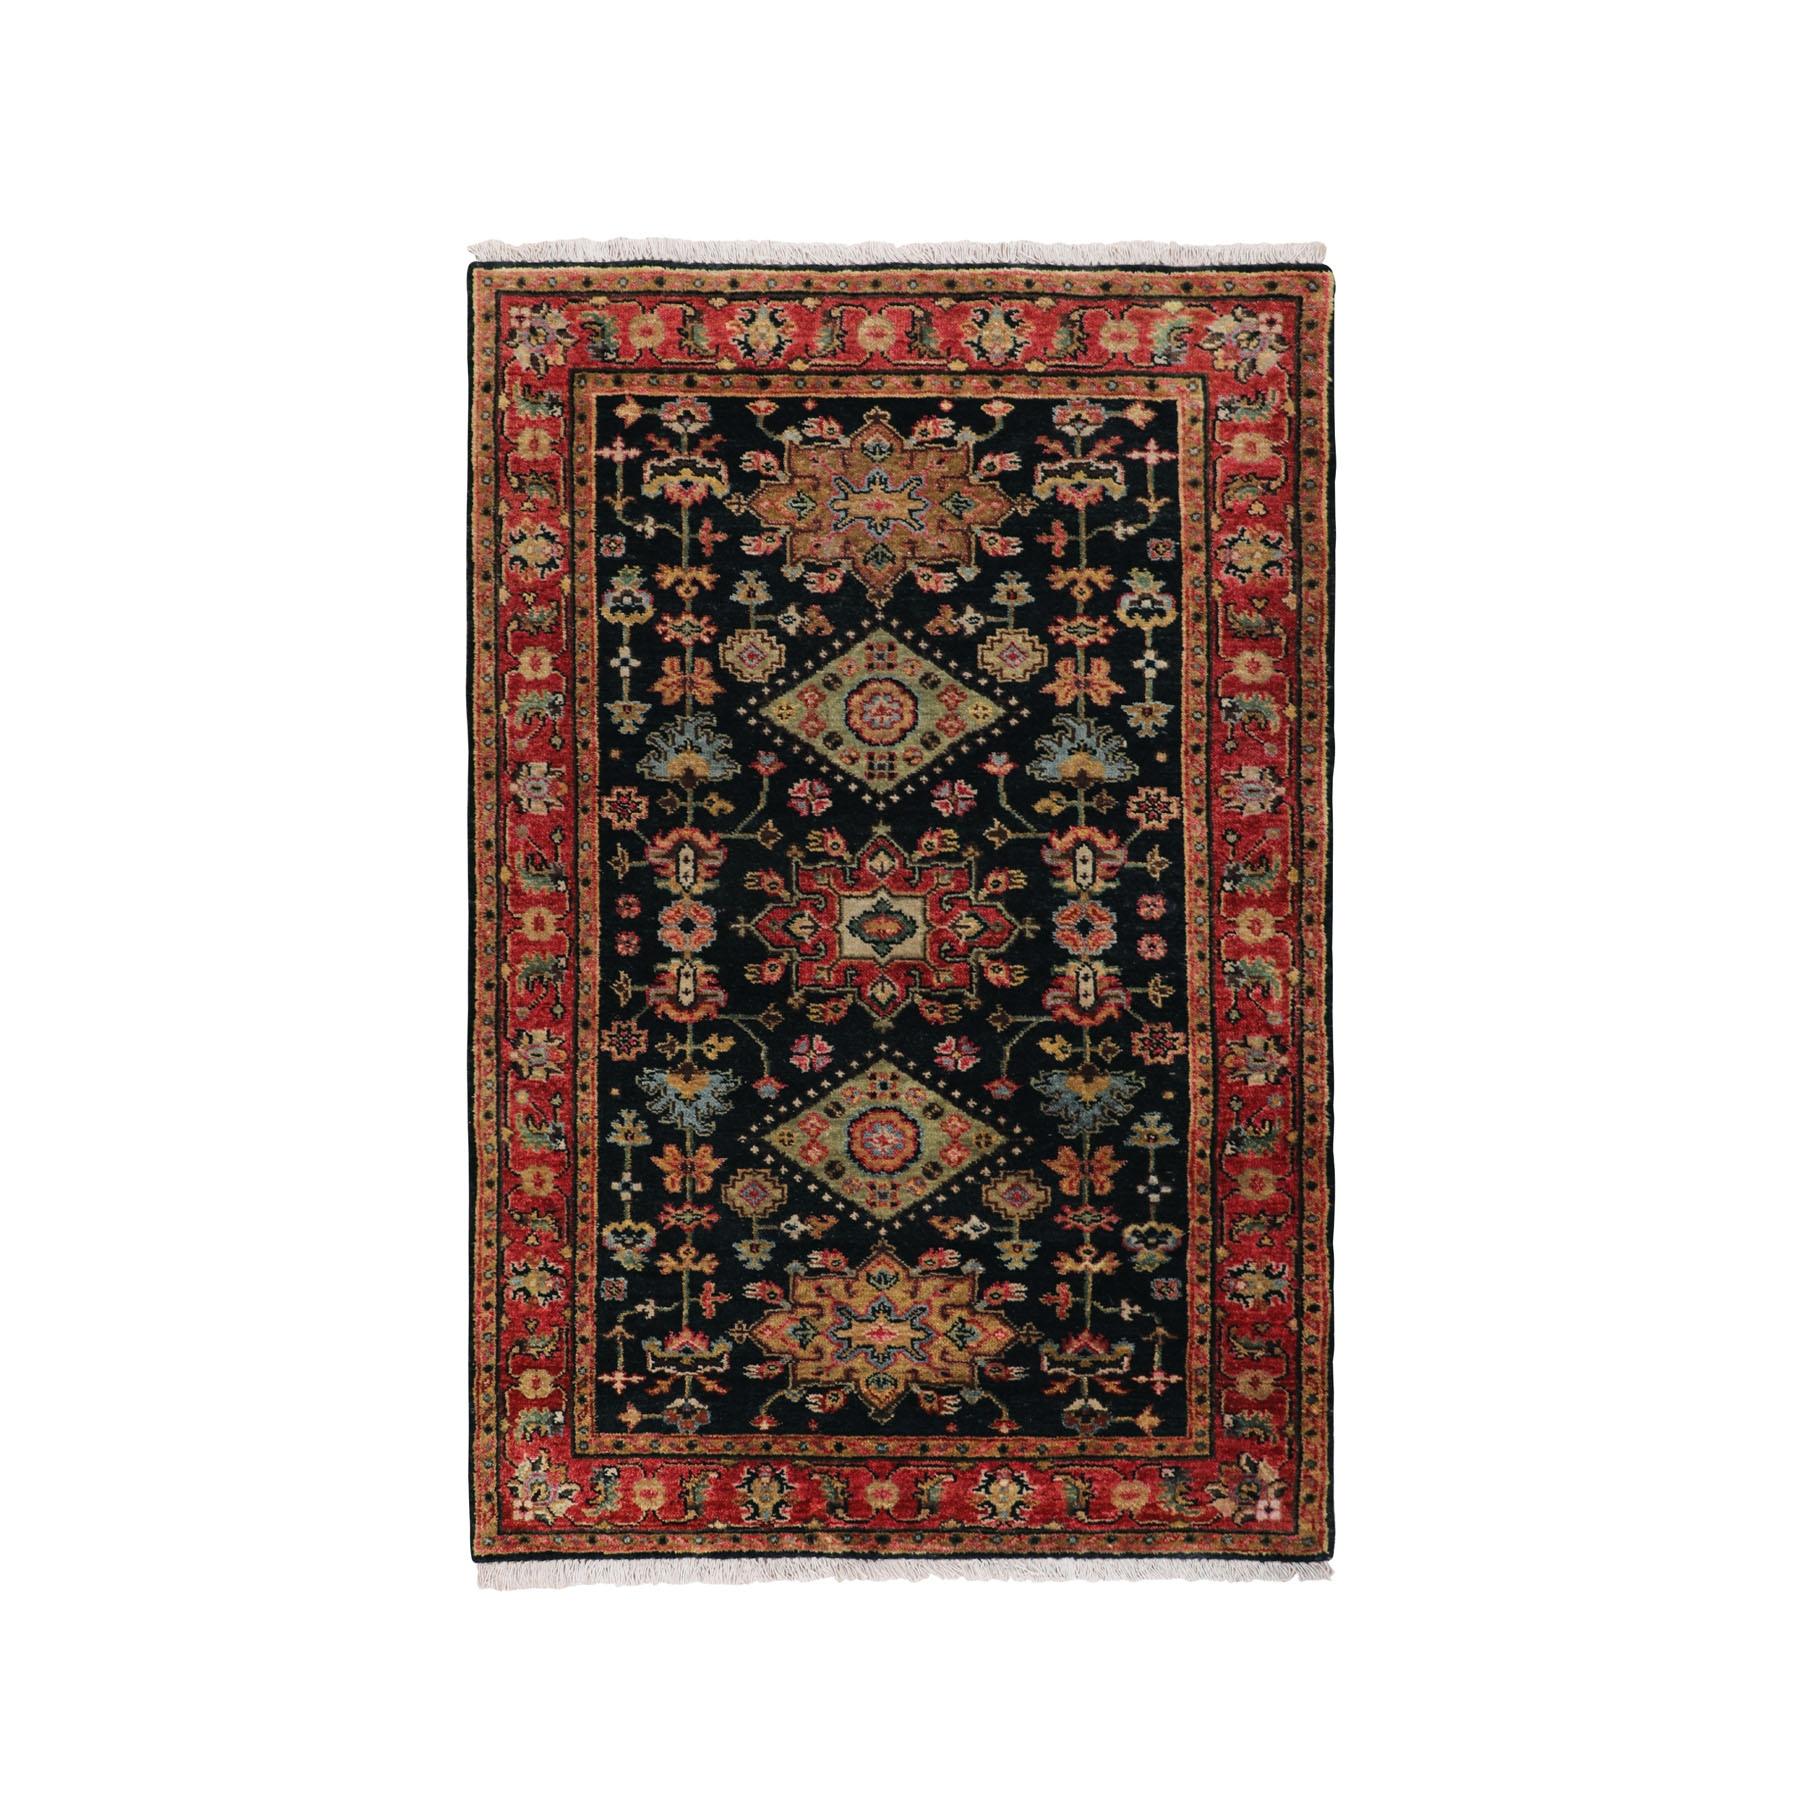 3'x5' Black Karajeh Design Hand Knotted Pure Wool Oriental Rug